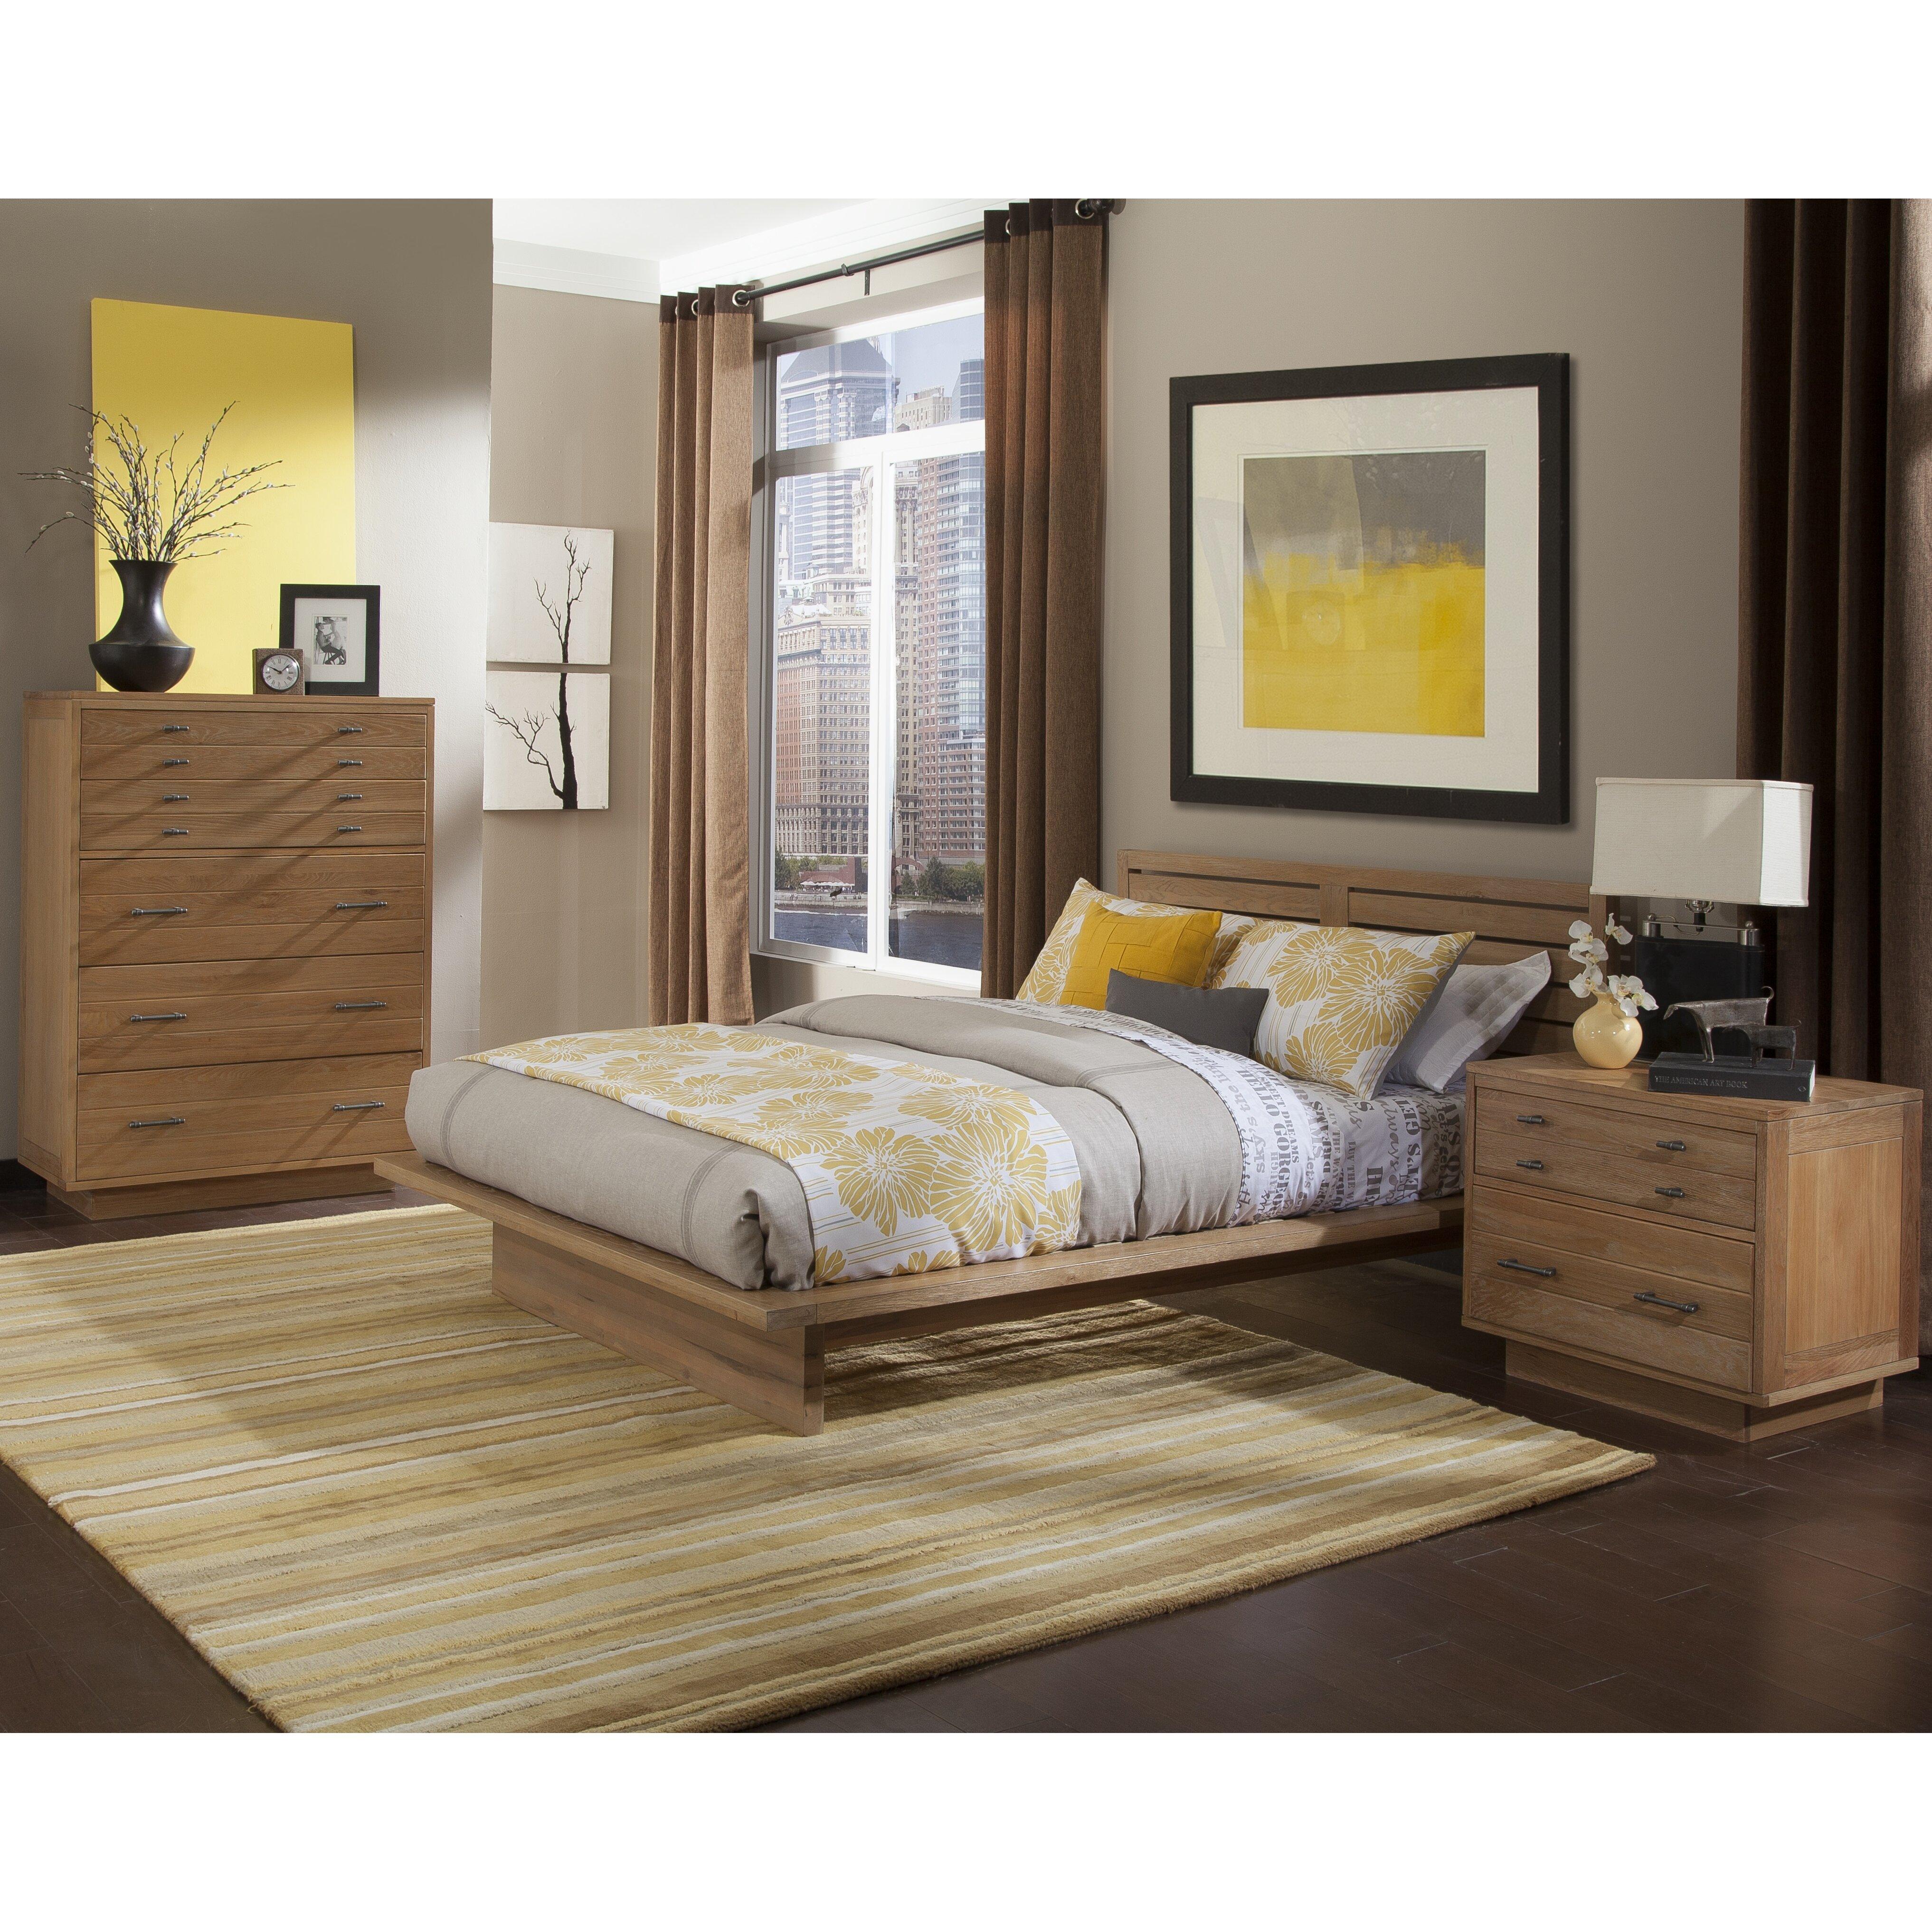 Cresent Furniture Hudson Slat Customizable Bedroom Set Reviews Wayfair